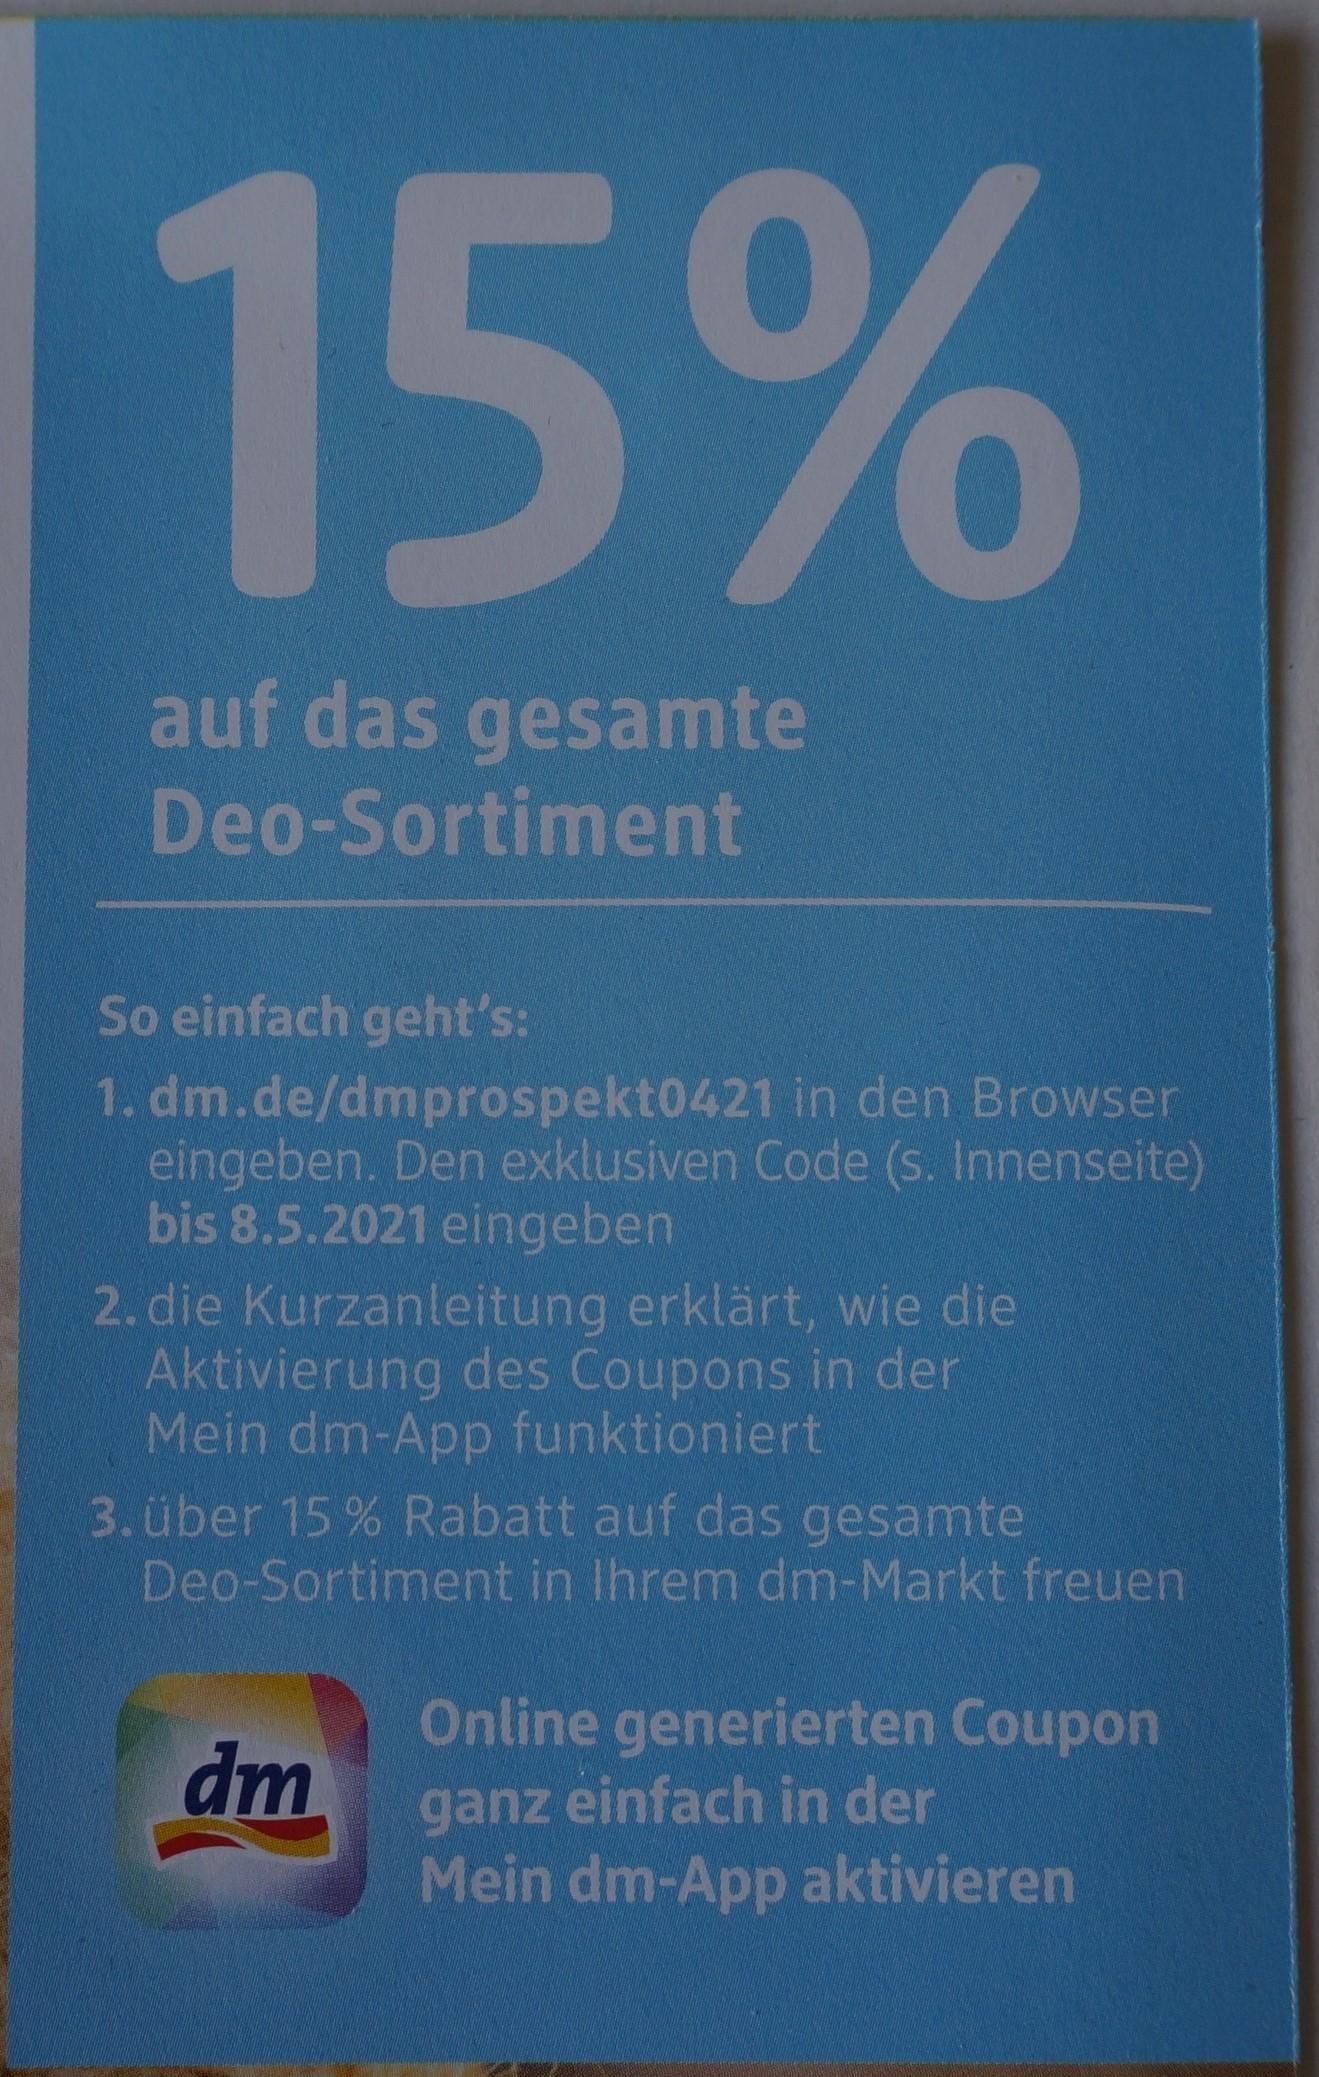 [dm] (Lokal ausgewählte Filialen) 15% Rabatt Coupon auf das Deo Sortiment 07.04.- 08.05. 25 Tage gültig